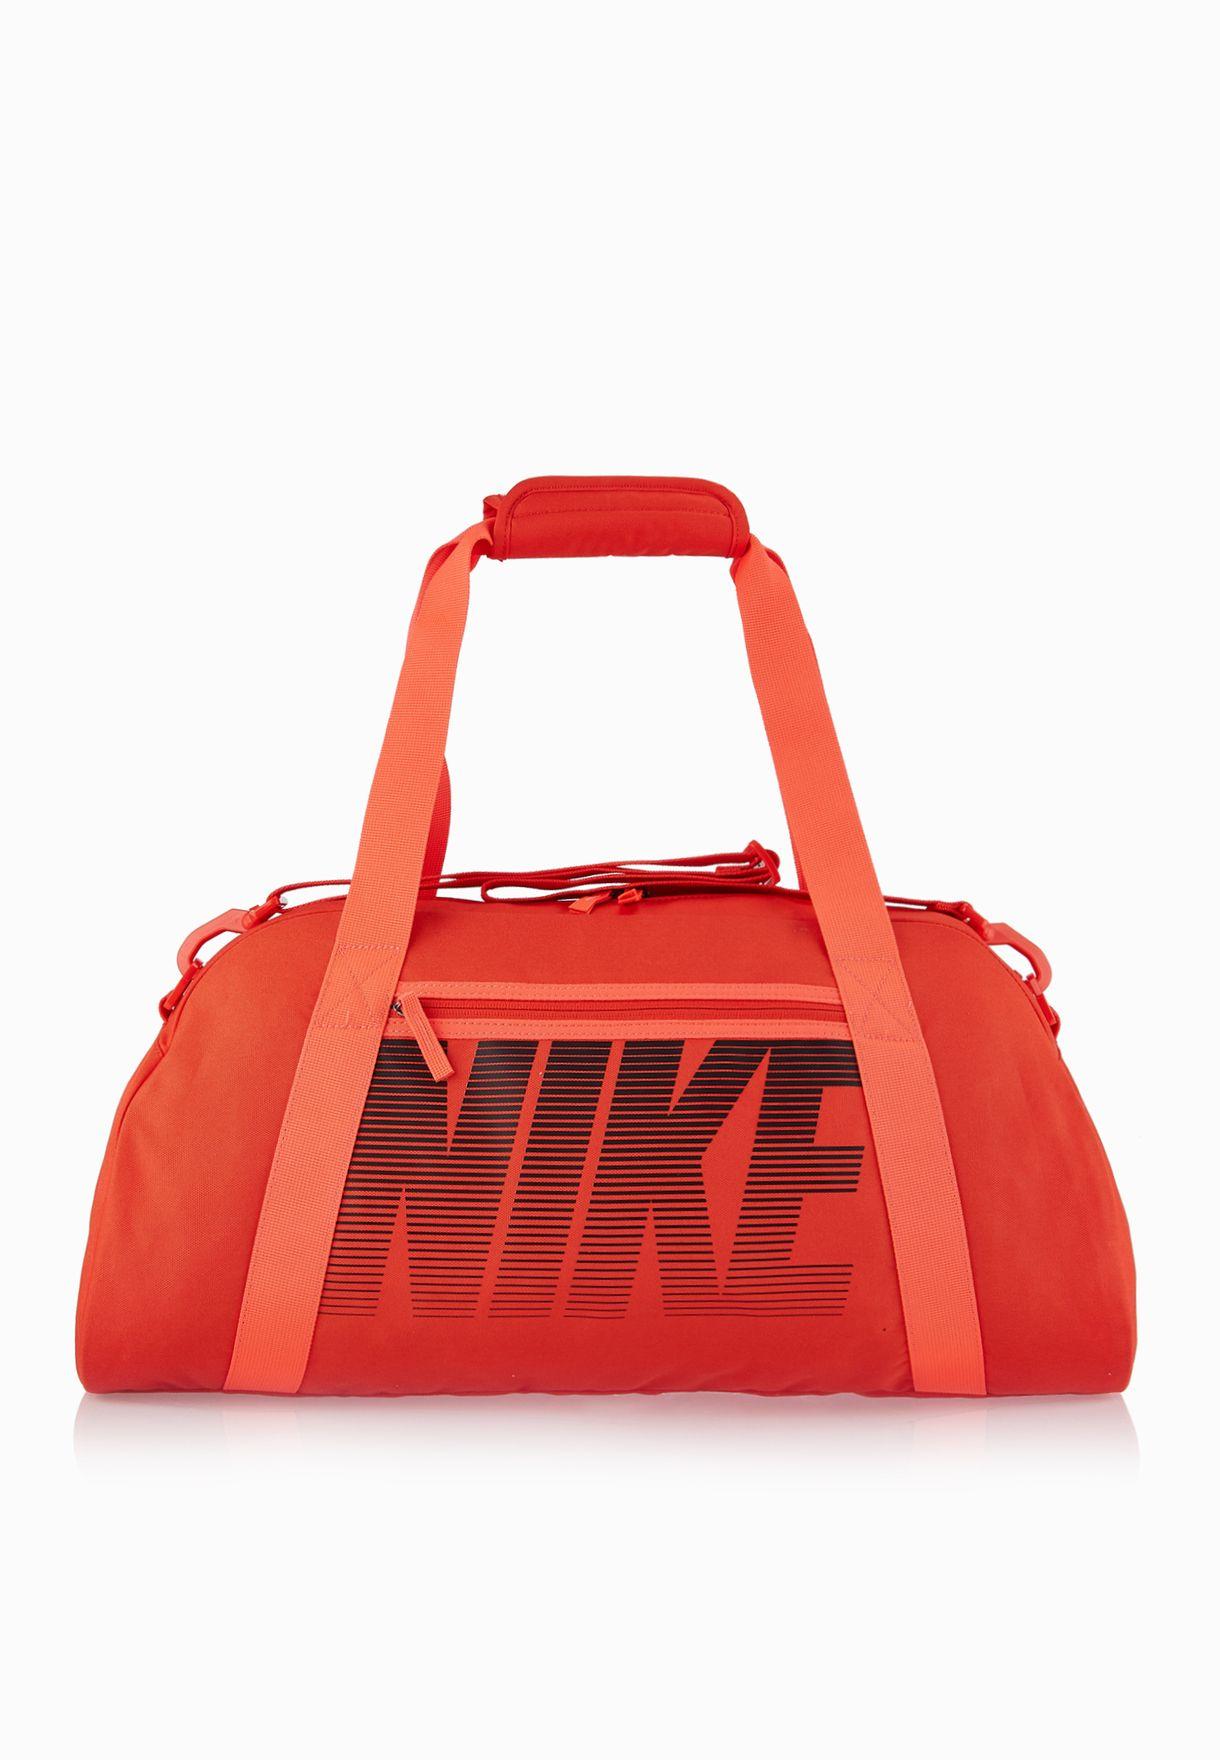 255aff9d9253 Shop Nike orange Women  39 S Gym Club Bag BA5167-657 for Women in ...